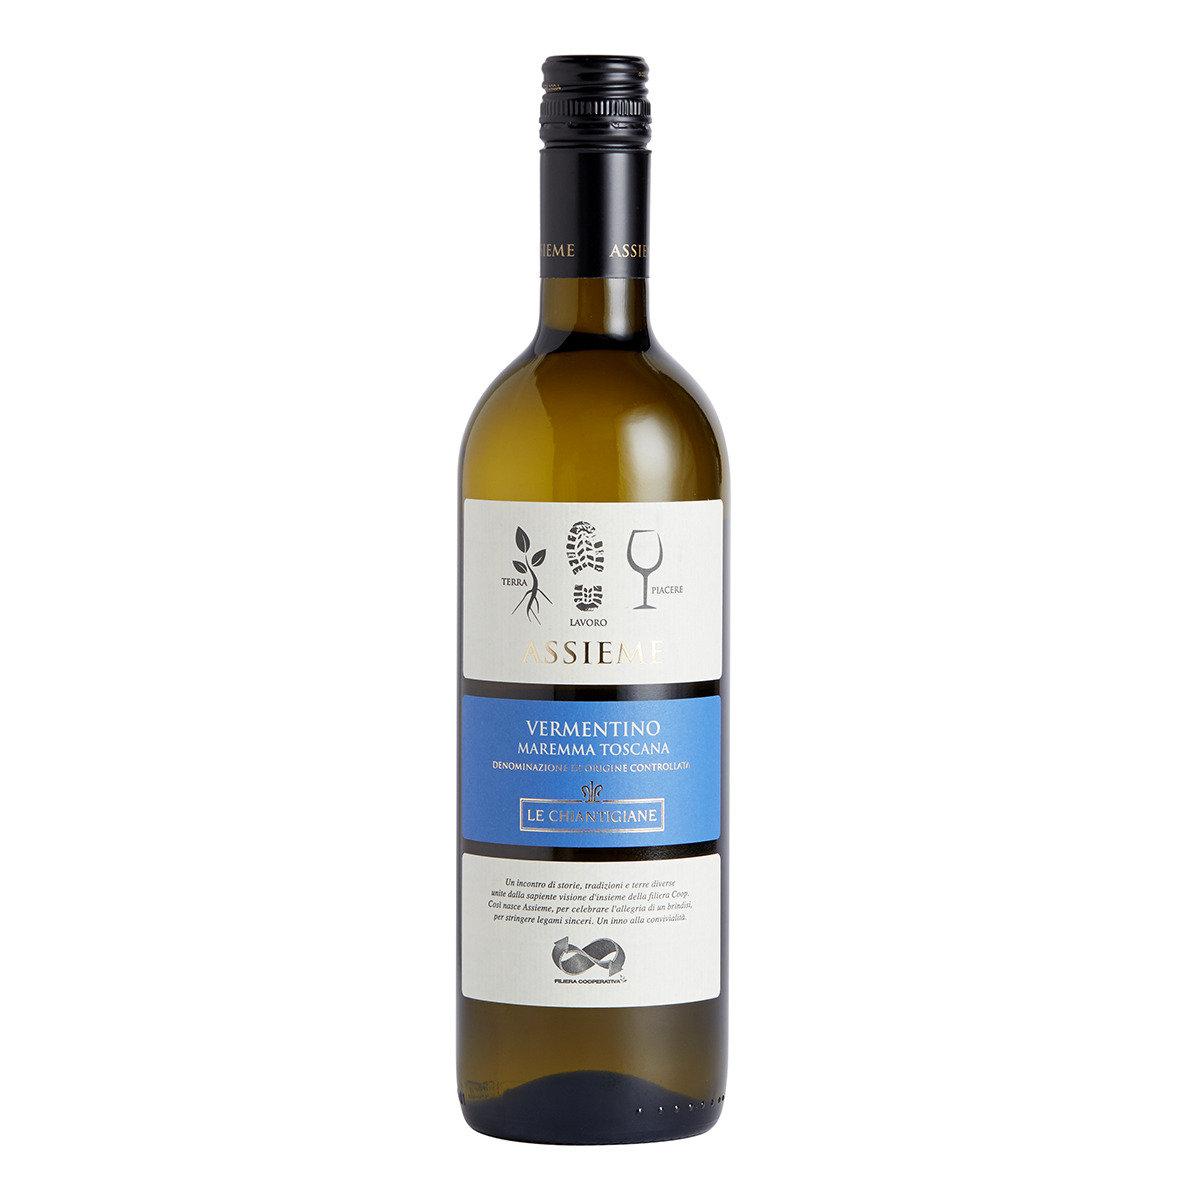 Vermentino Maremma Toscana DOC - 白酒